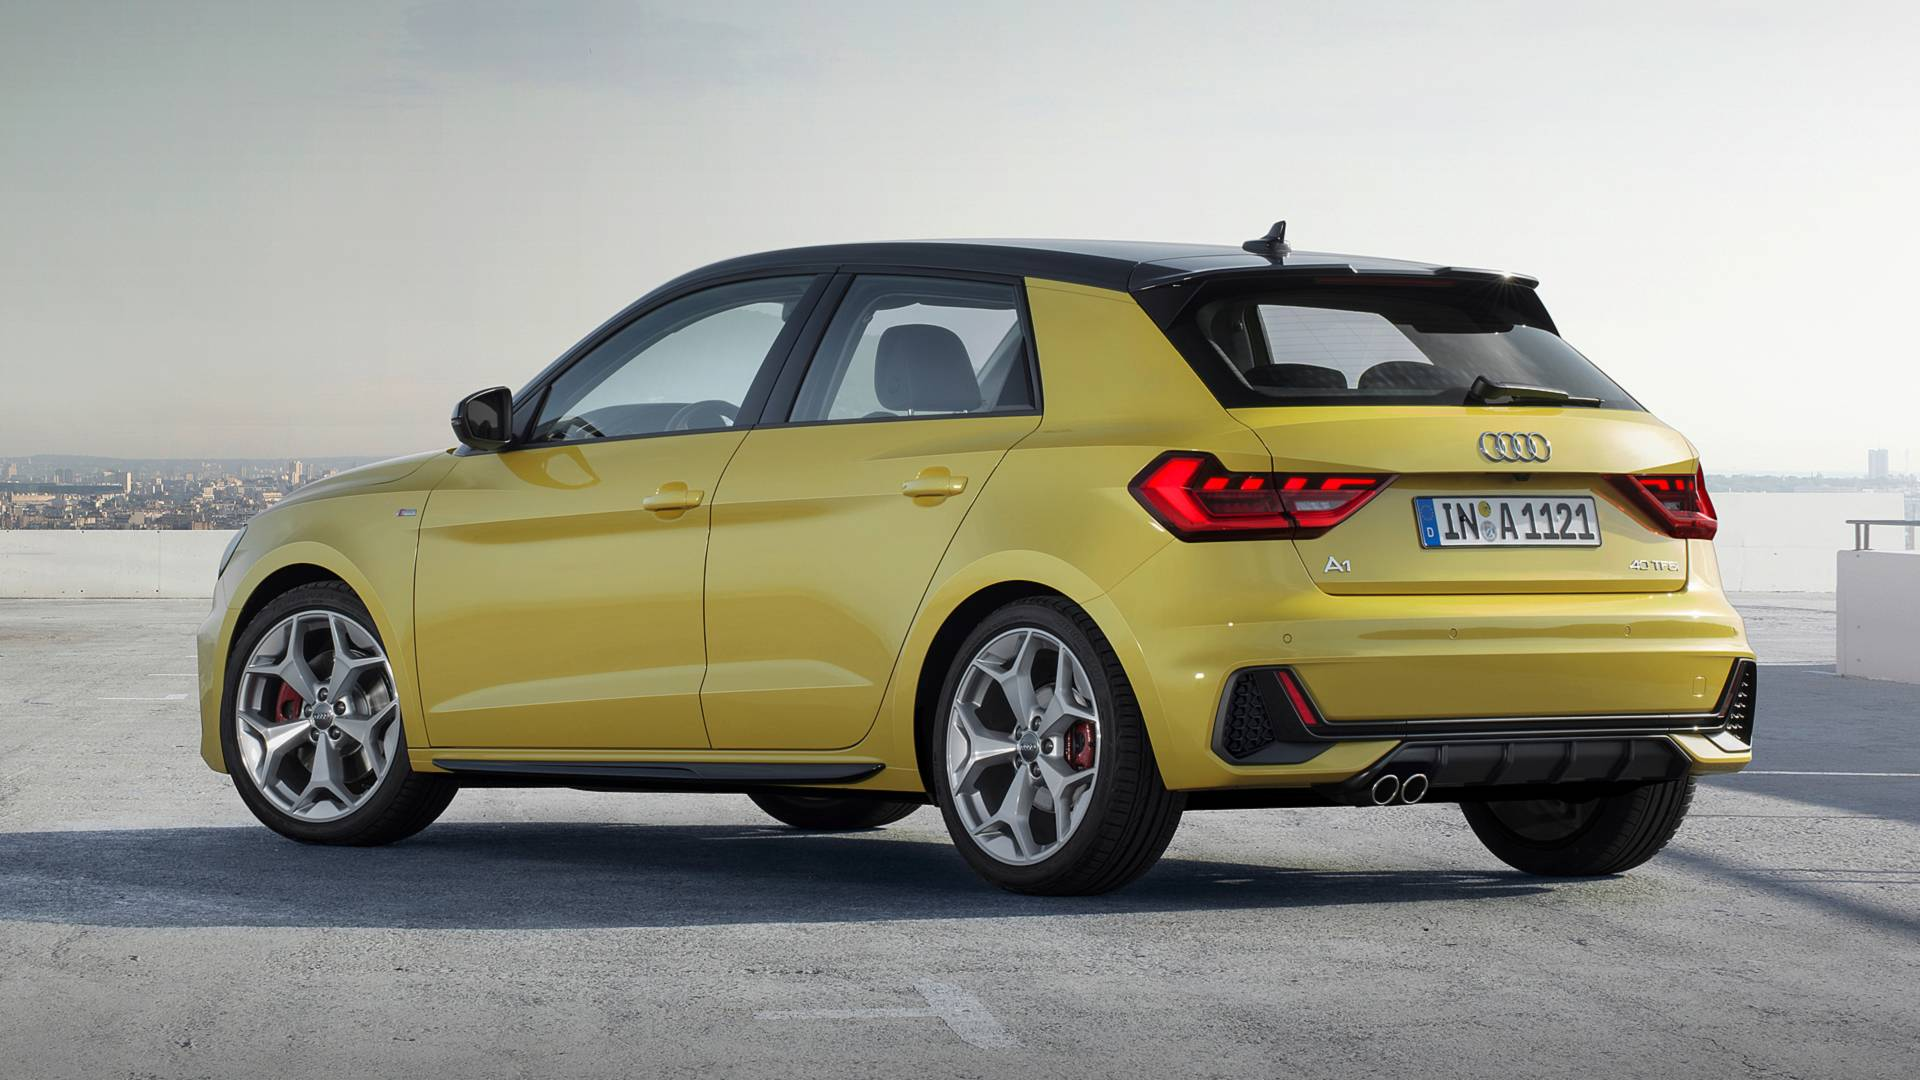 2019-Audi-A1-Sportback 40 TFSI